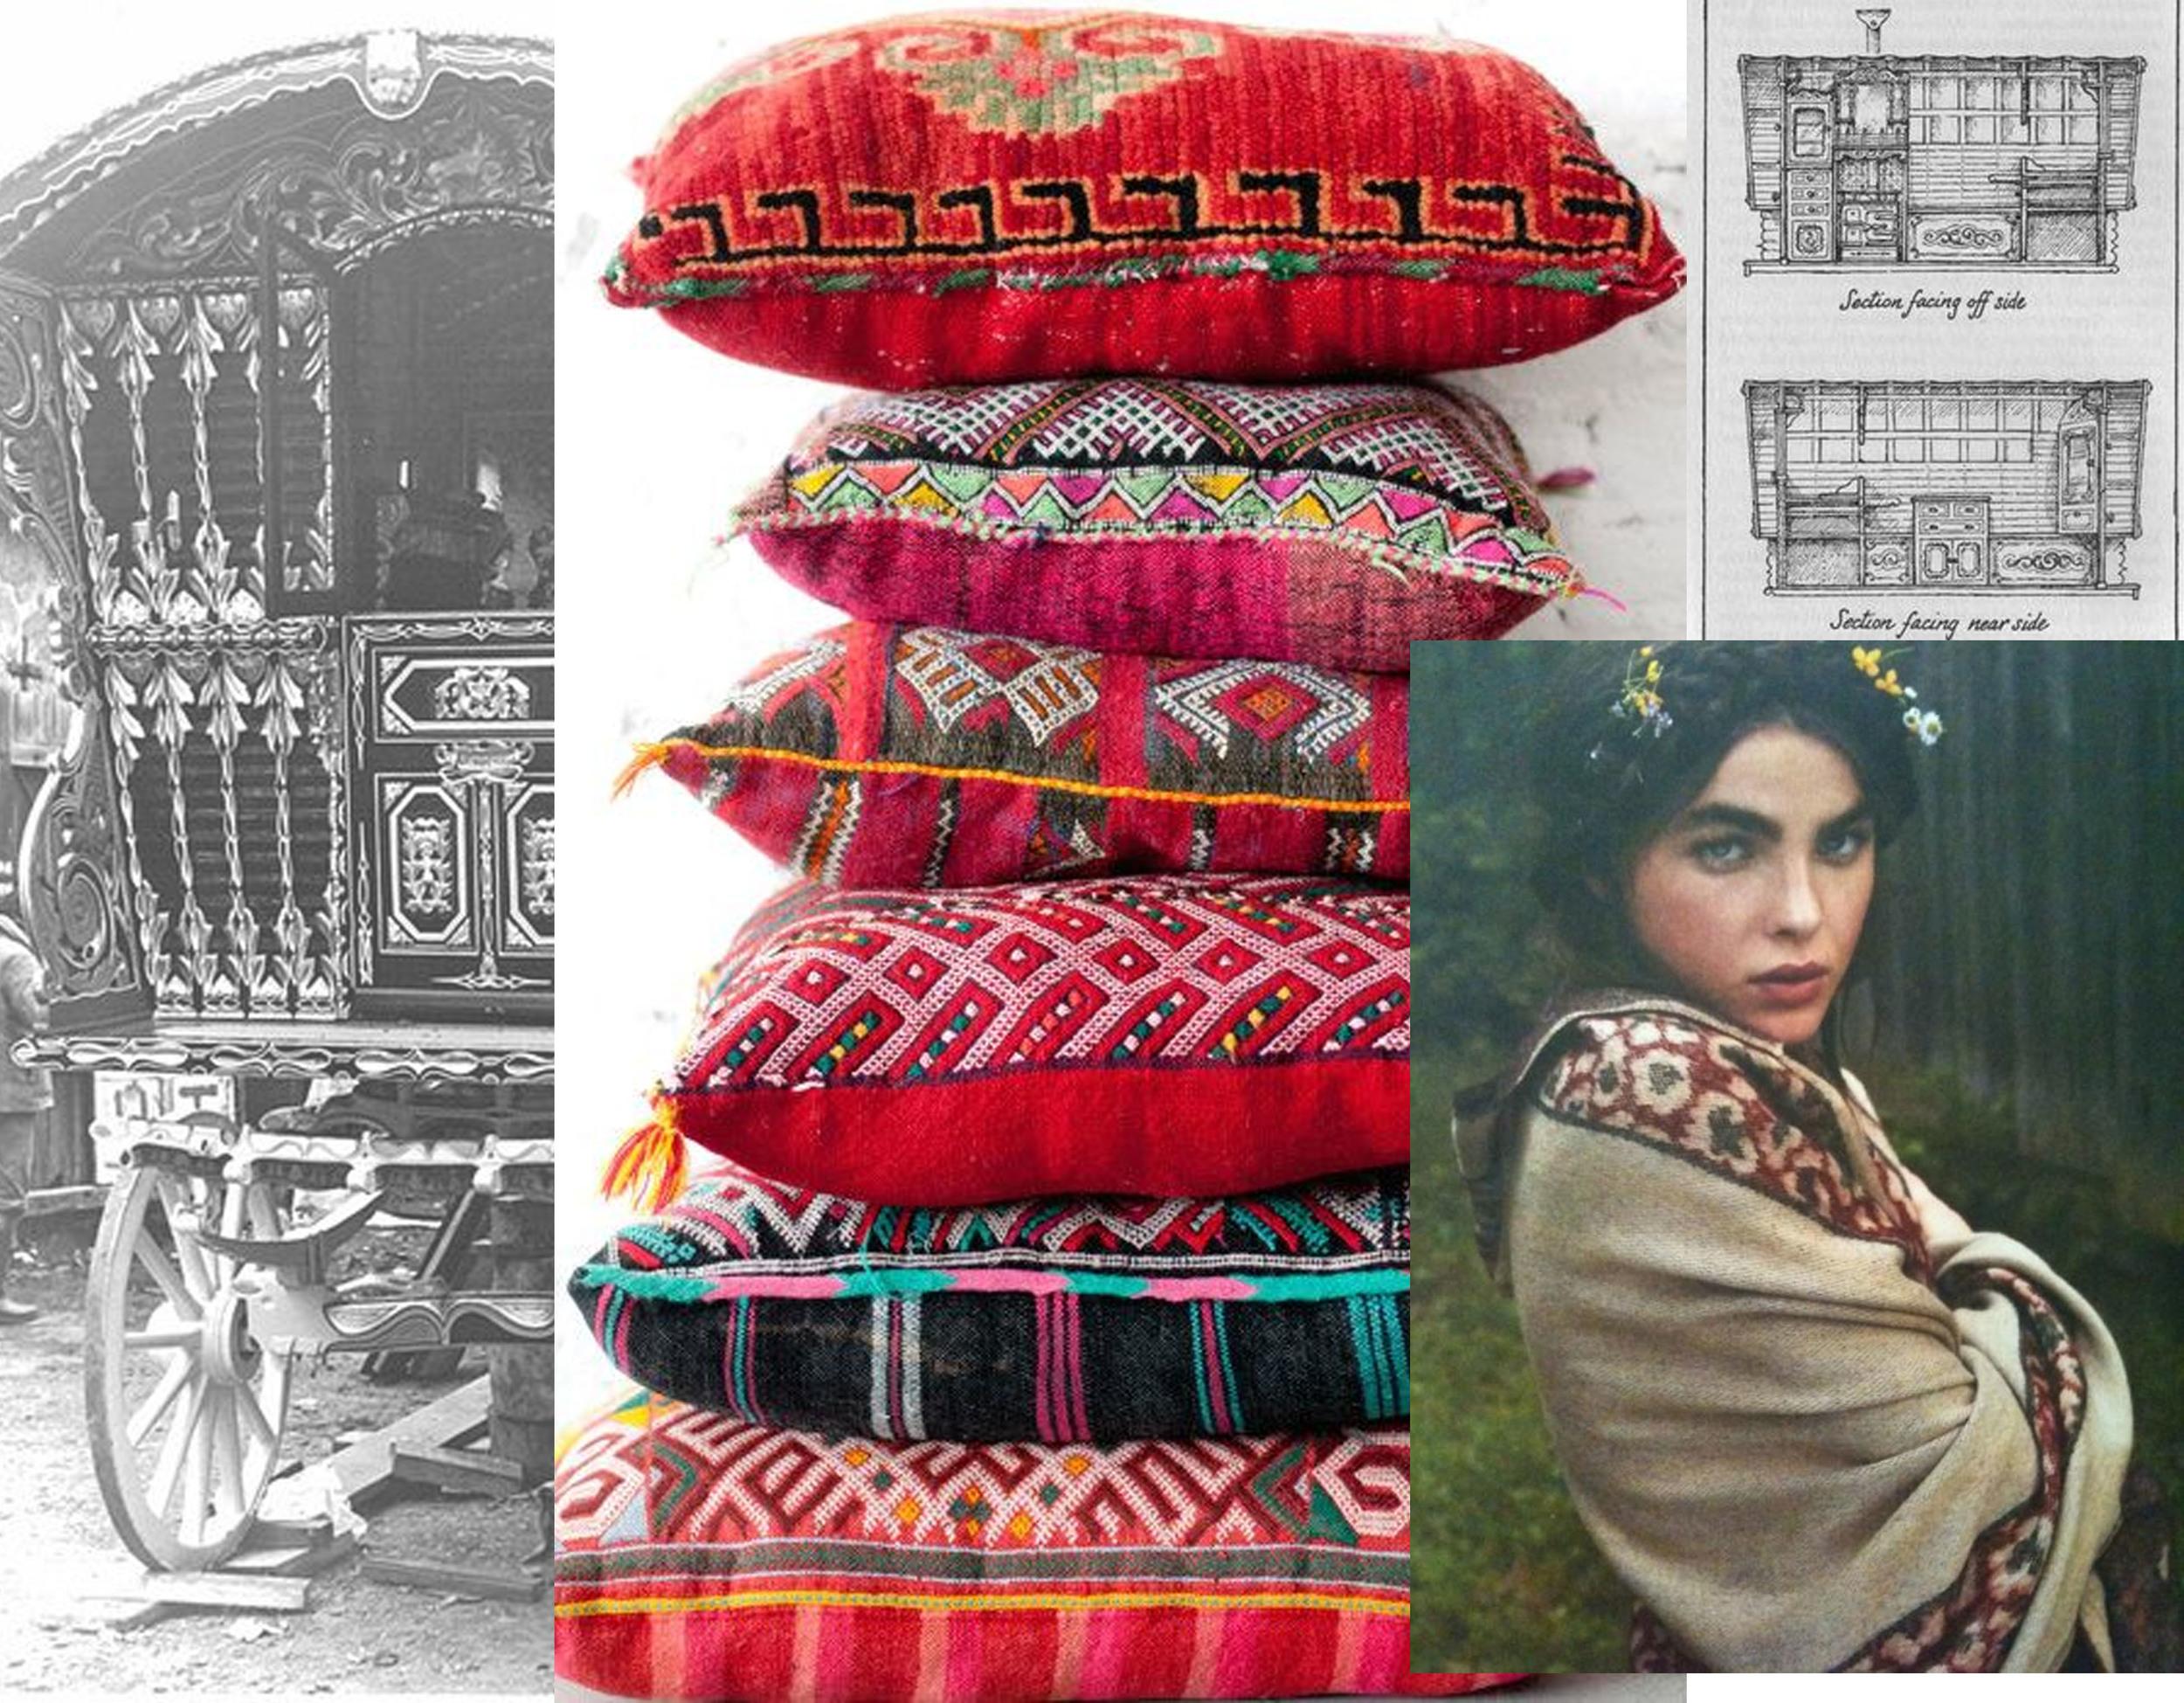 Vardo wagon via  Flickr  - Moroccon pillows  Patina Rentals  - Gypsy girl via  Moon 2 Moon